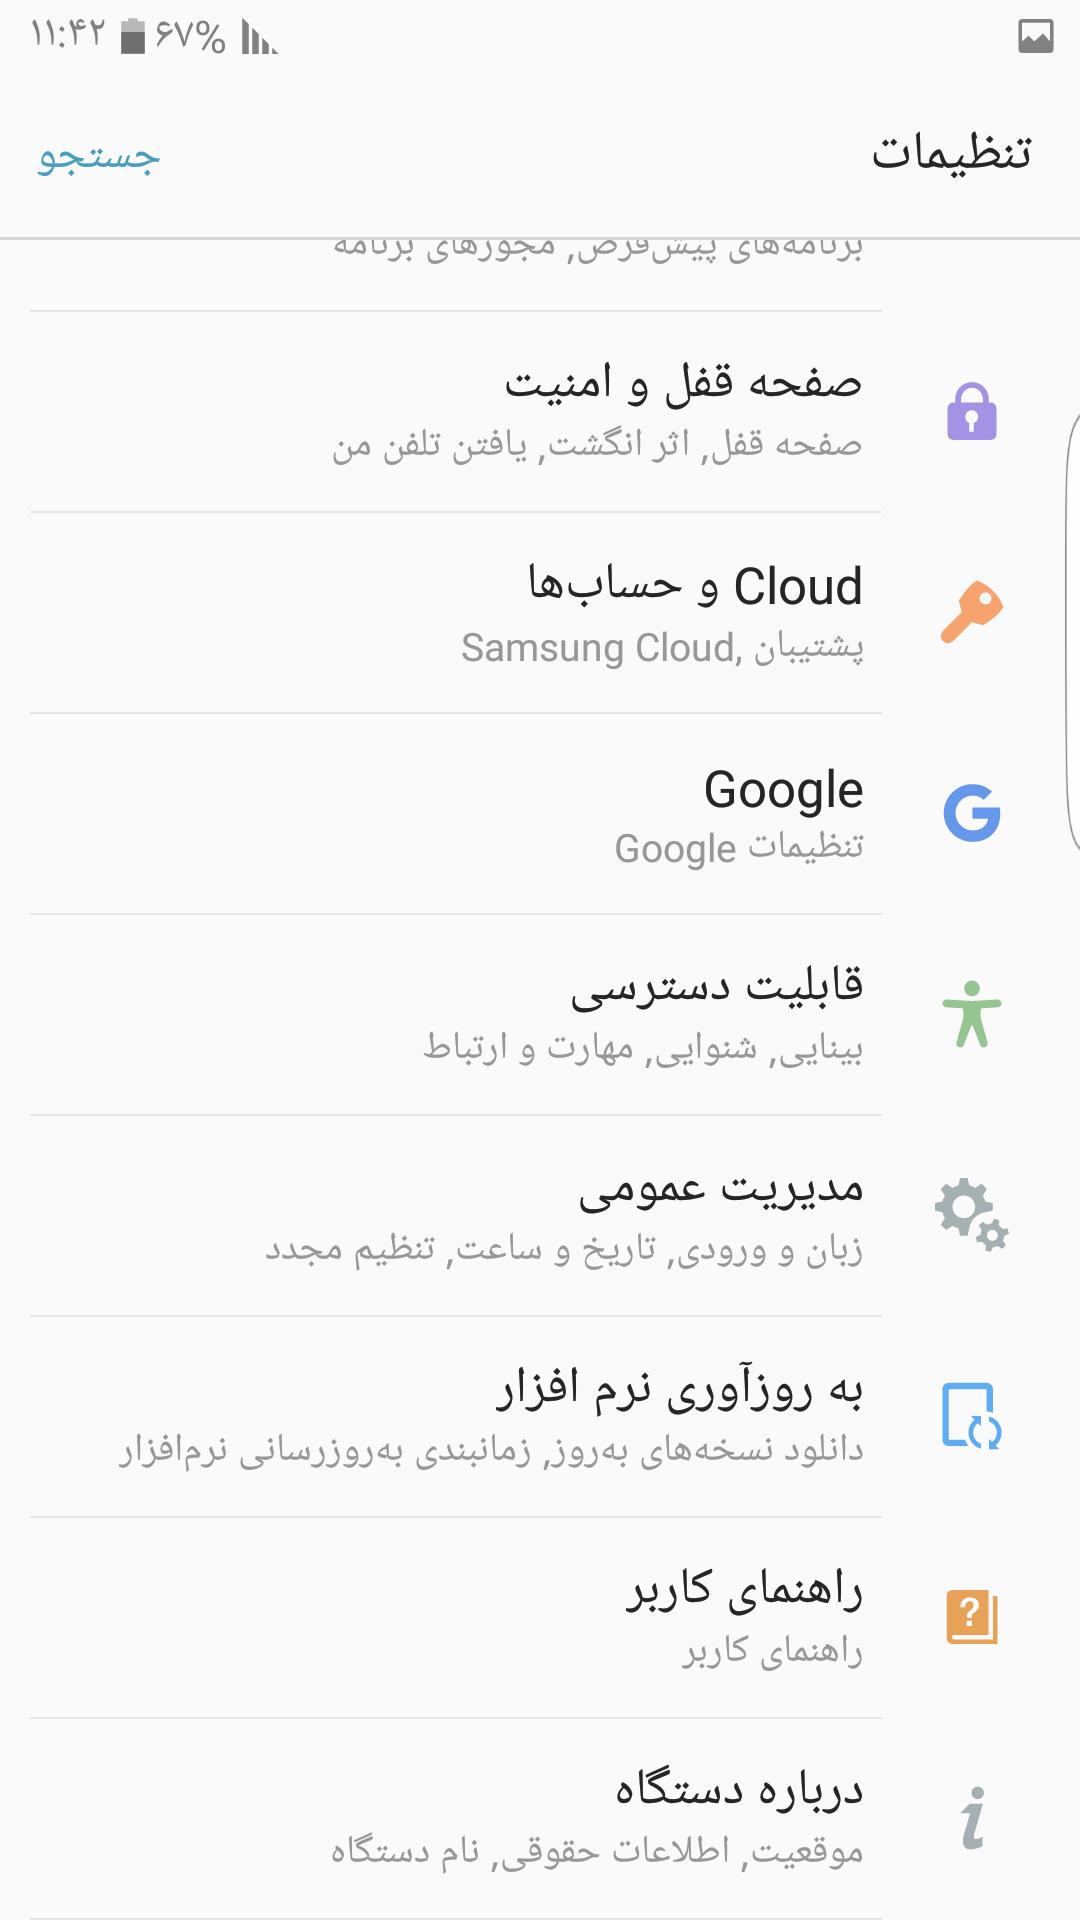 Screenshot_۲۰۱۷۰۳۰۵-۱۱۴۲۲۲